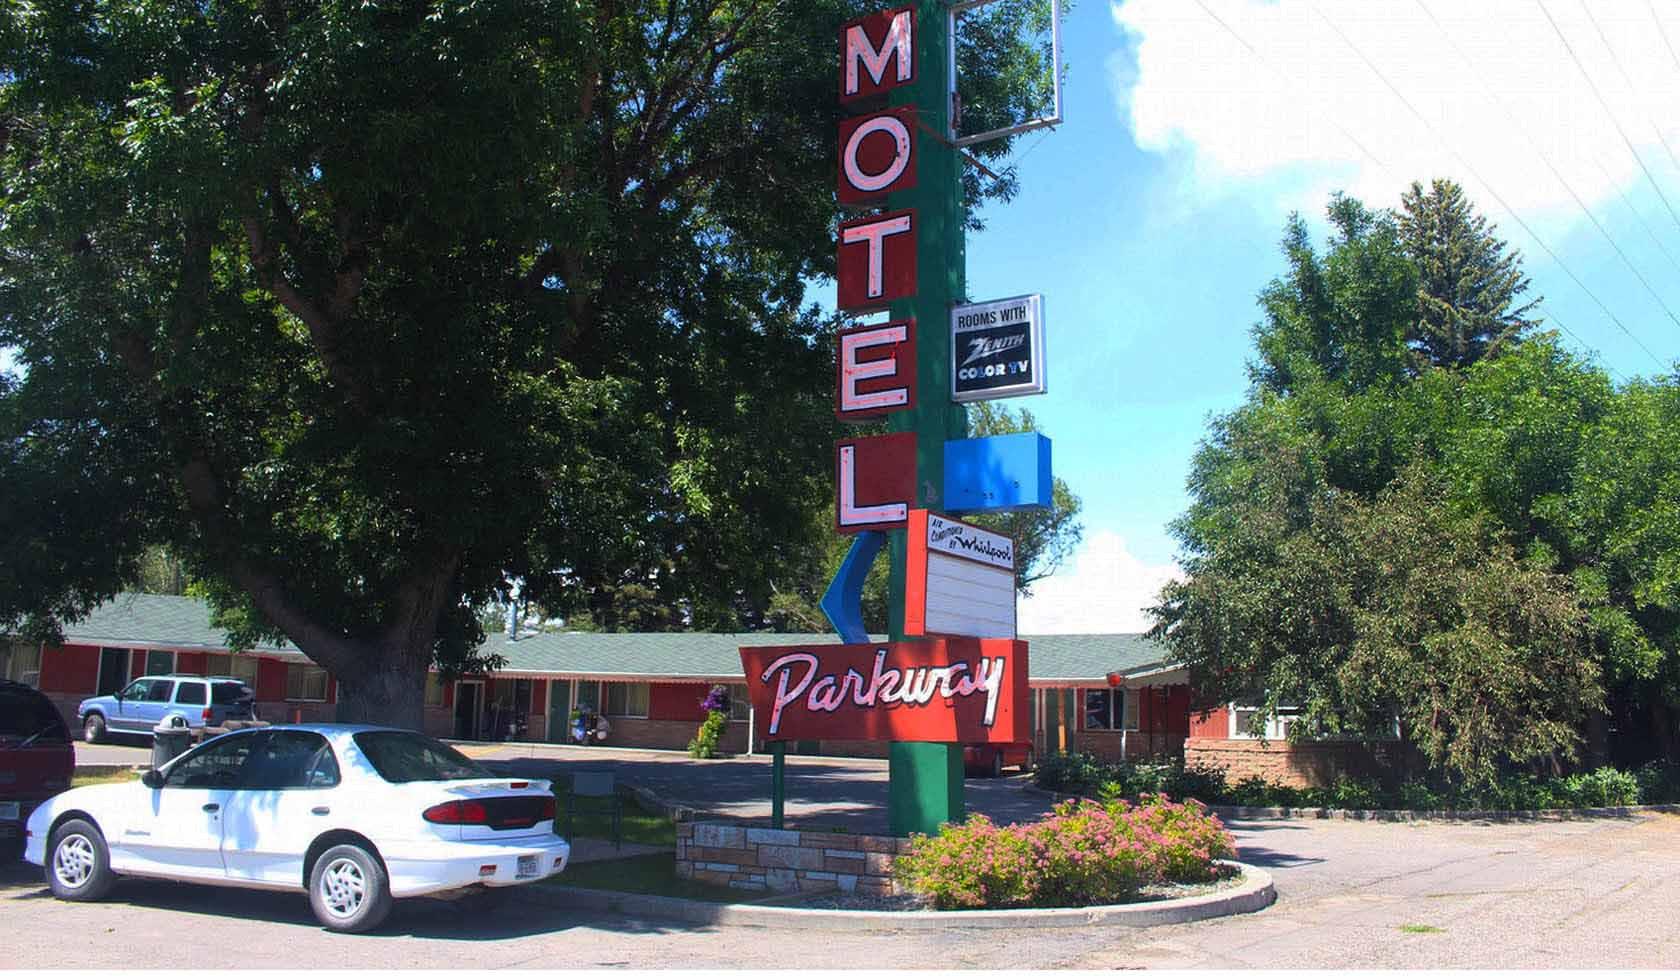 Budget Host Parkway Motel profile image